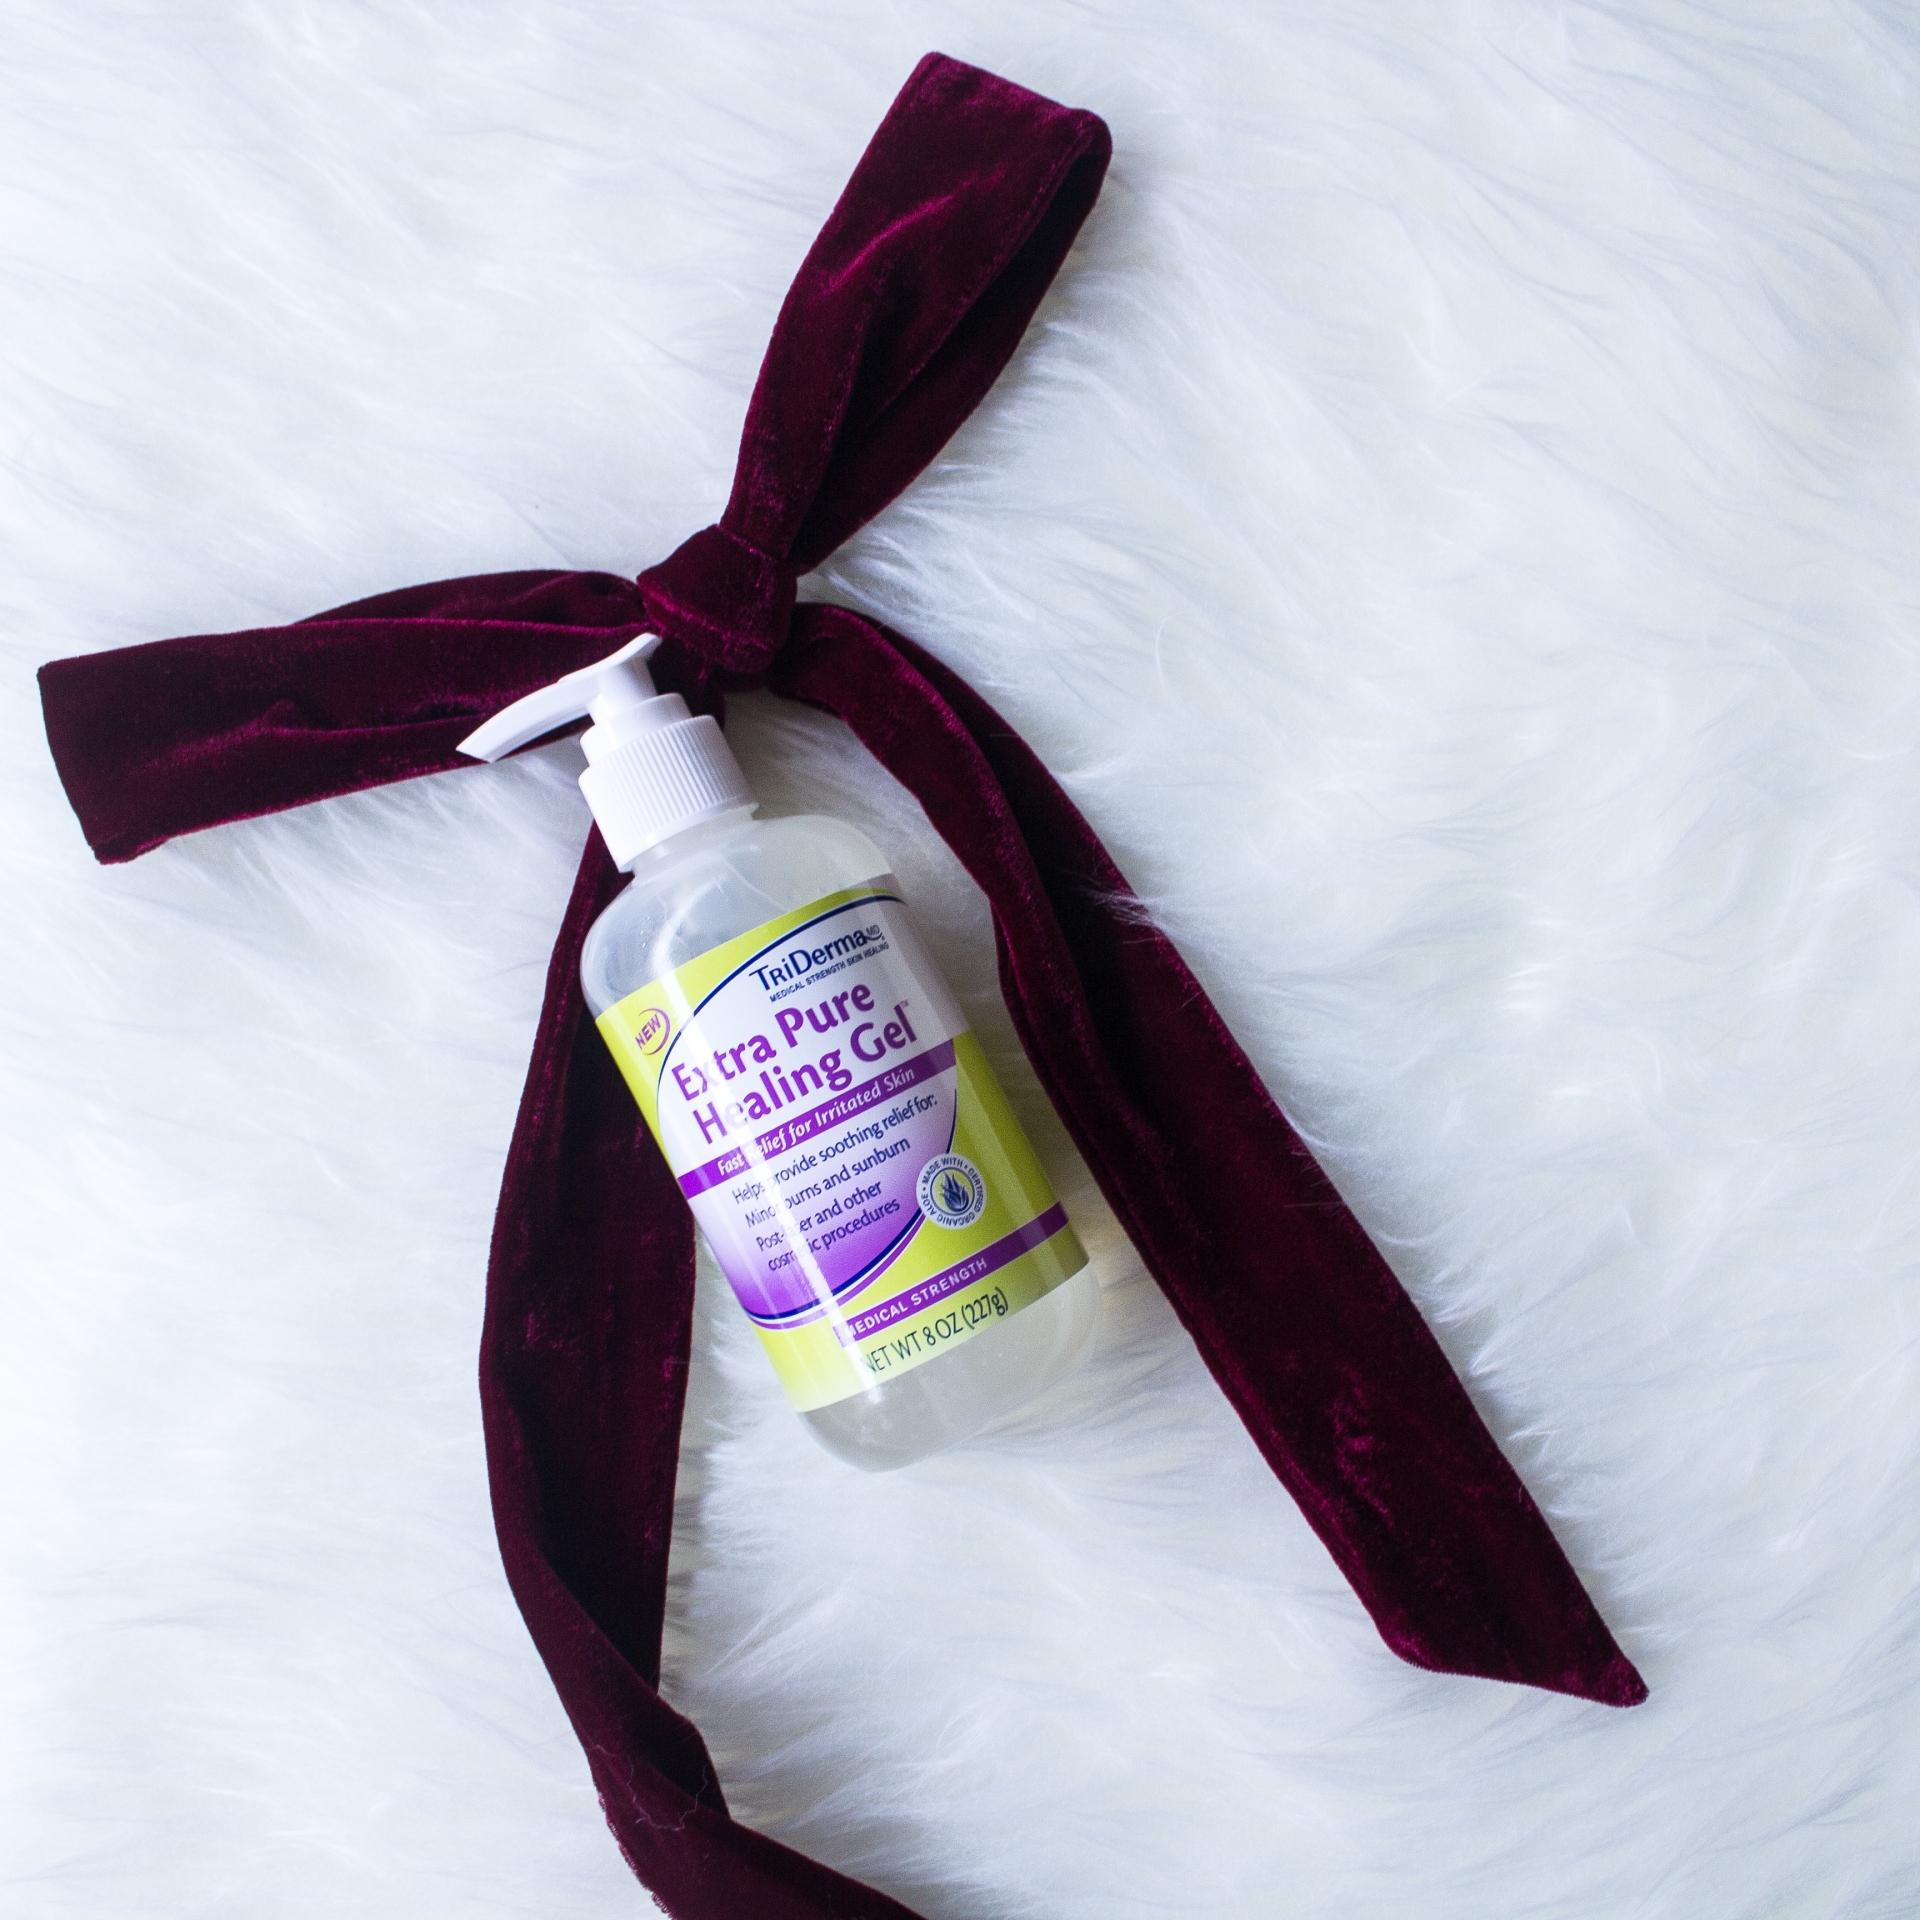 TriDerma Extra Pure Healing Gel